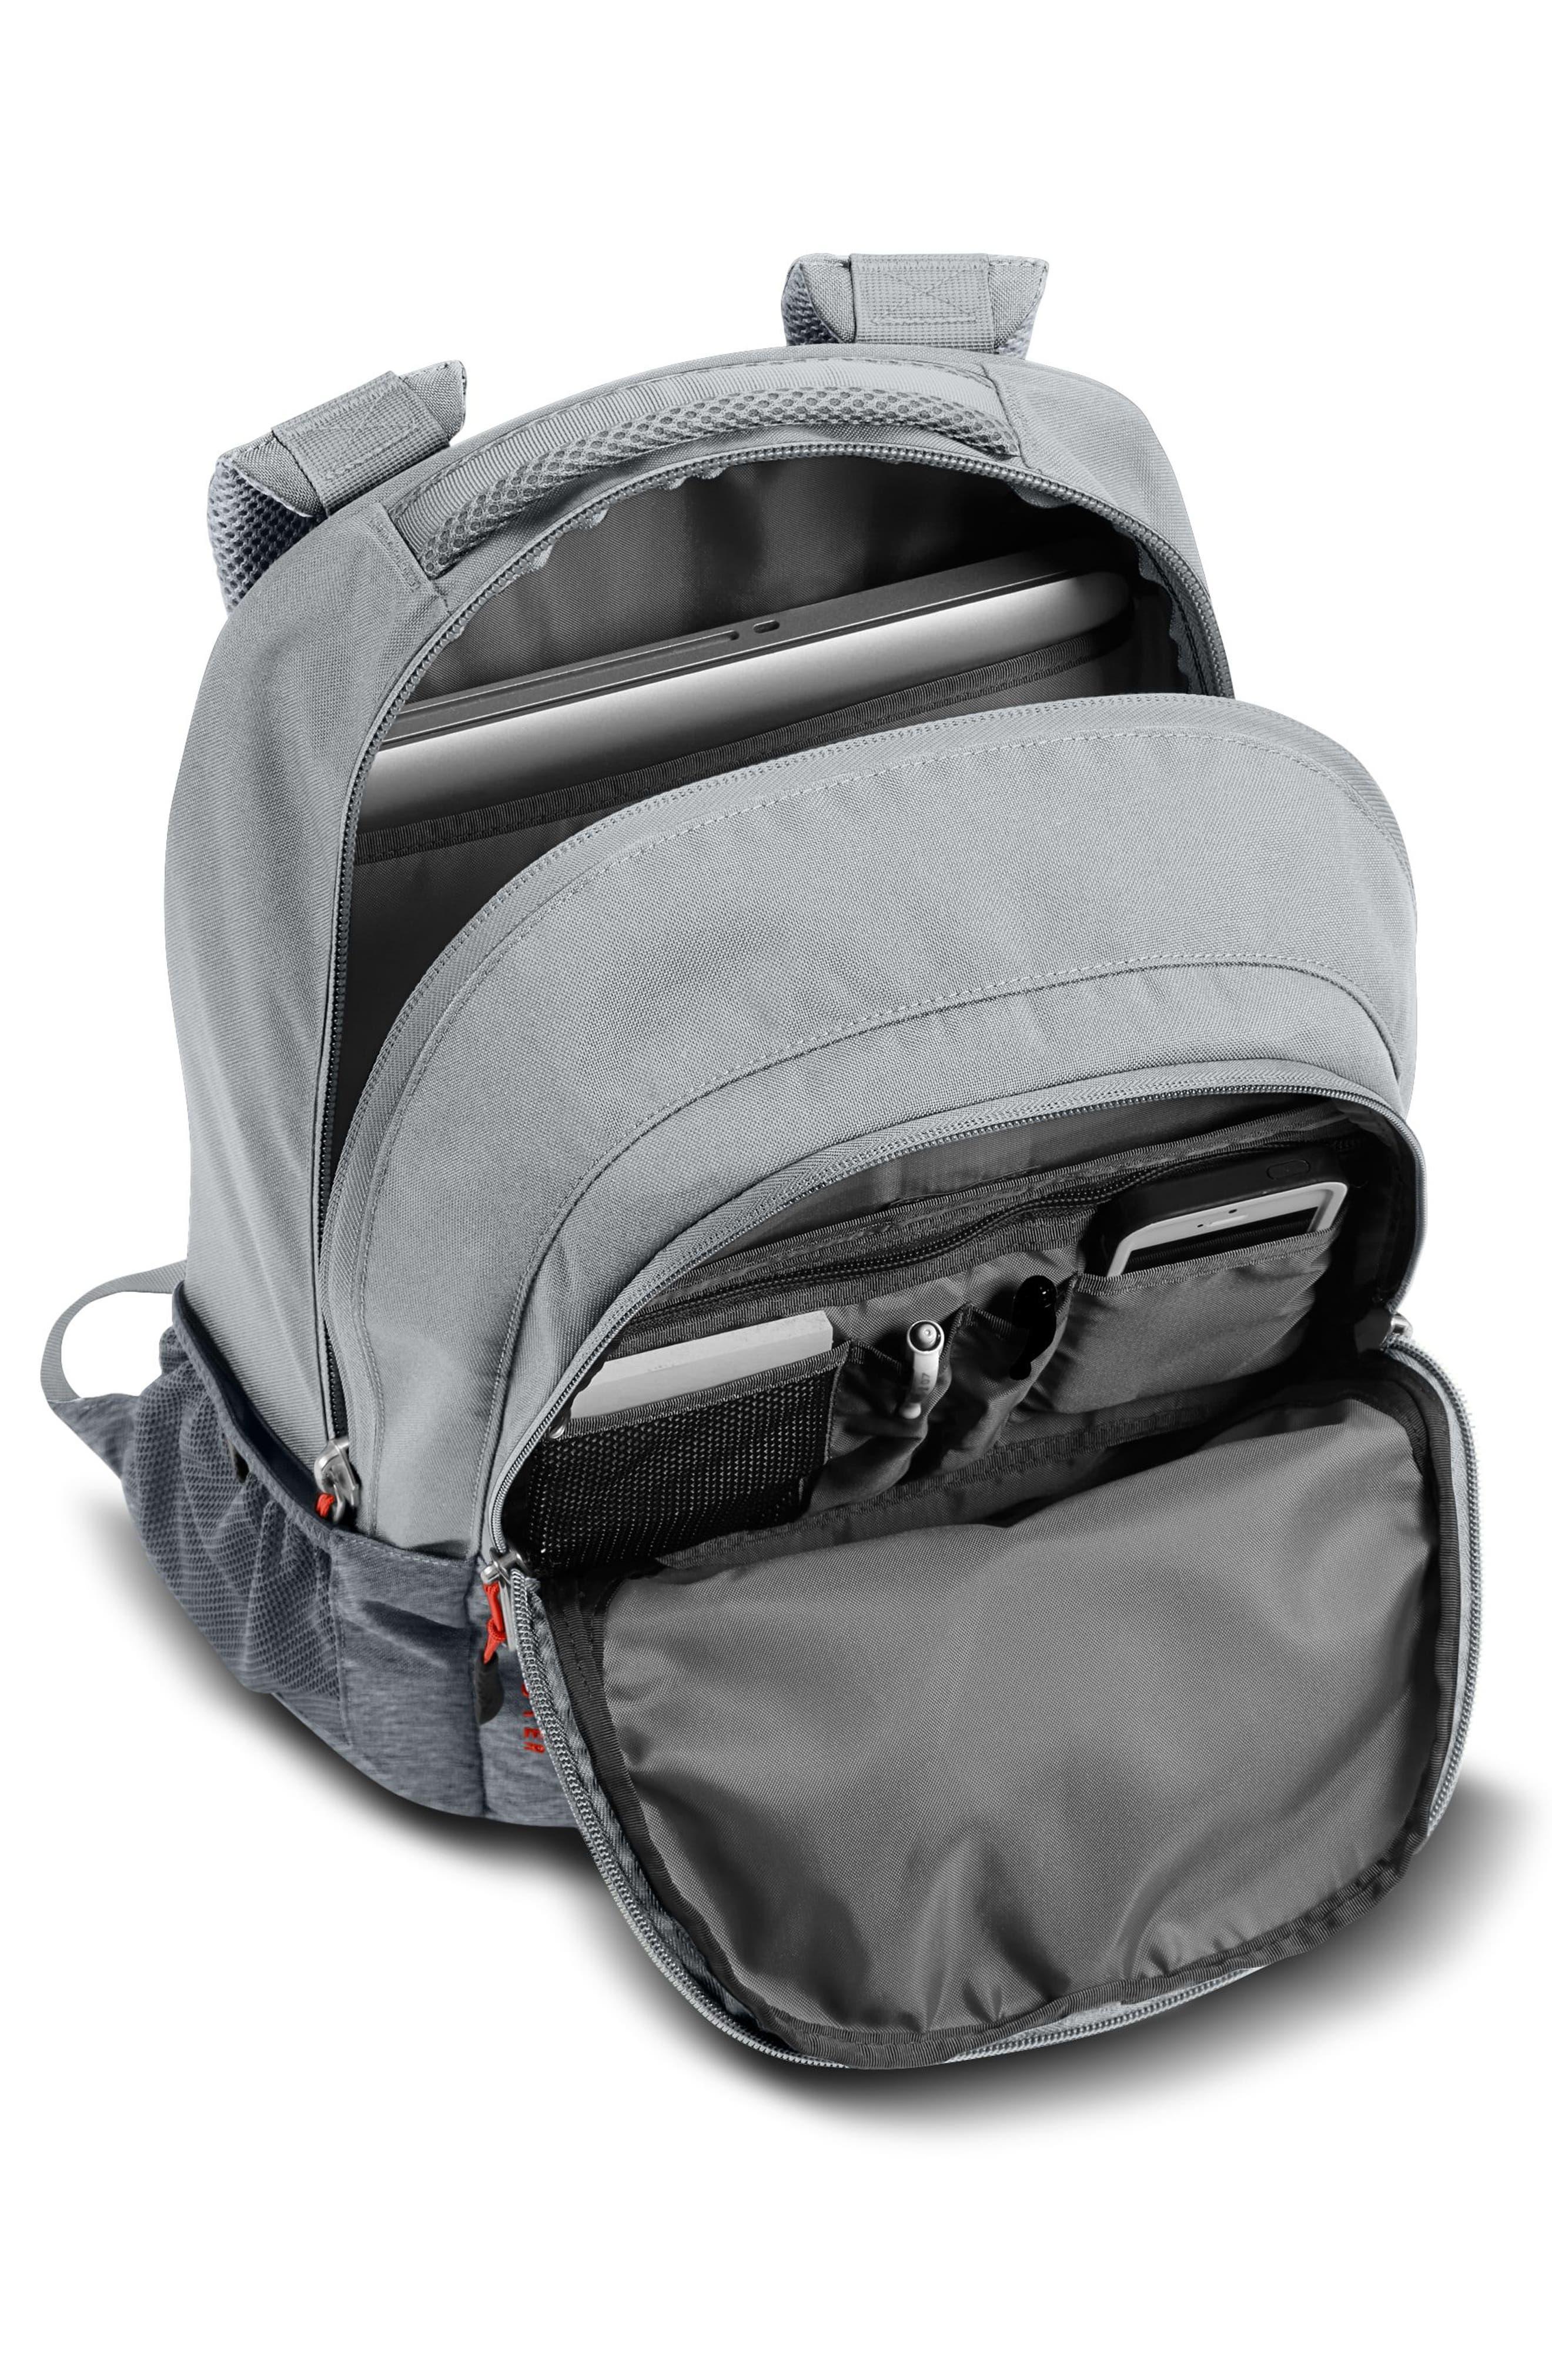 Jester Backpack,                             Alternate thumbnail 3, color,                             030